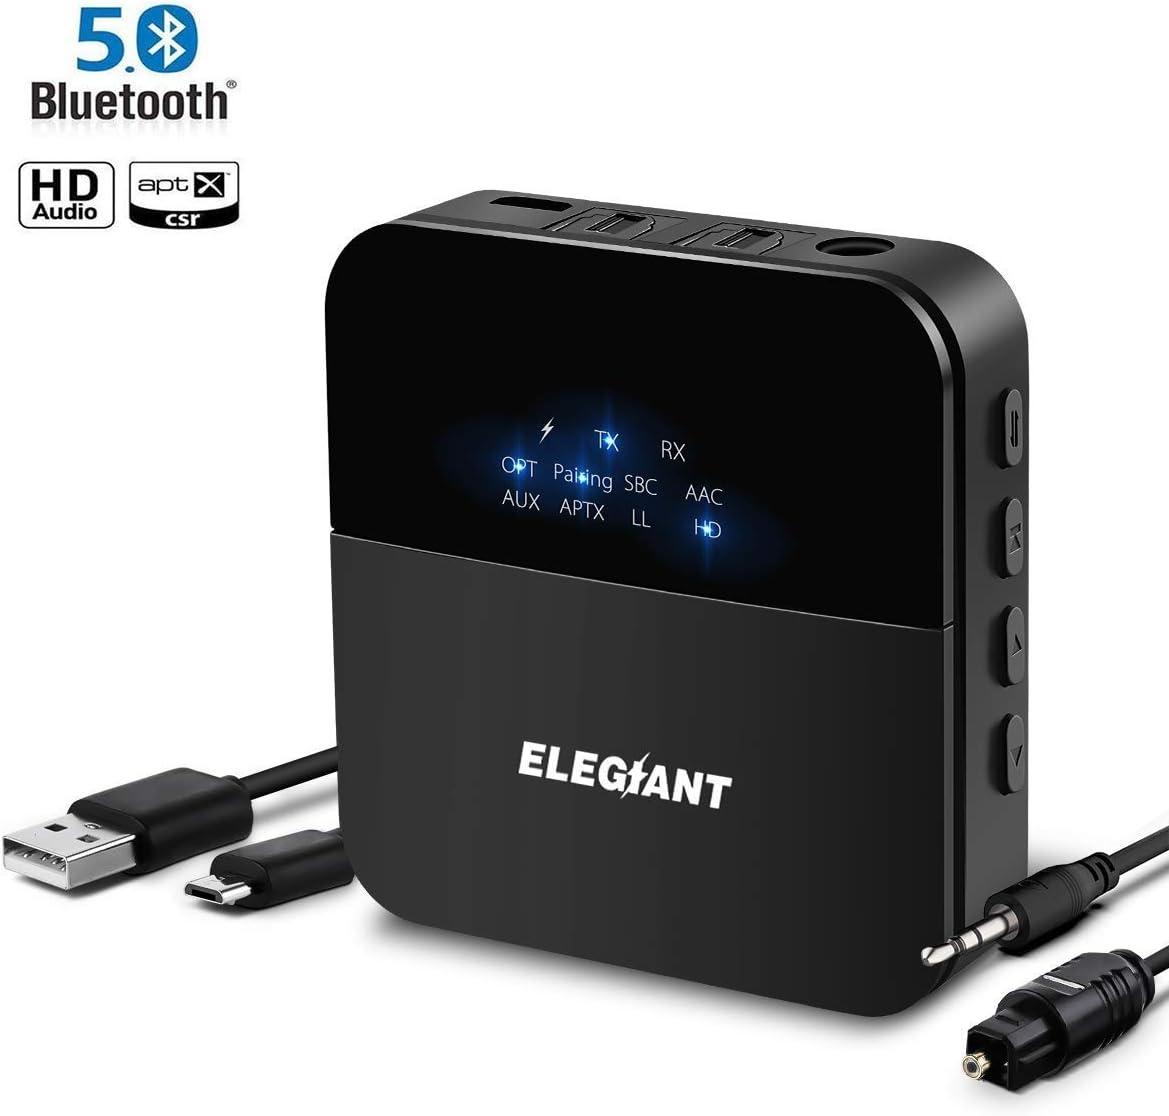 Receptor transmisor Bluetooth 5.0 ELEGIANT Adaptador de audio inalámbrico portátil AptX HD AptX LL Rango con 3,5 mm Óptica digital Toslink 2 Cable de conexión RCA para TV Estéreo Altavoz HiFi